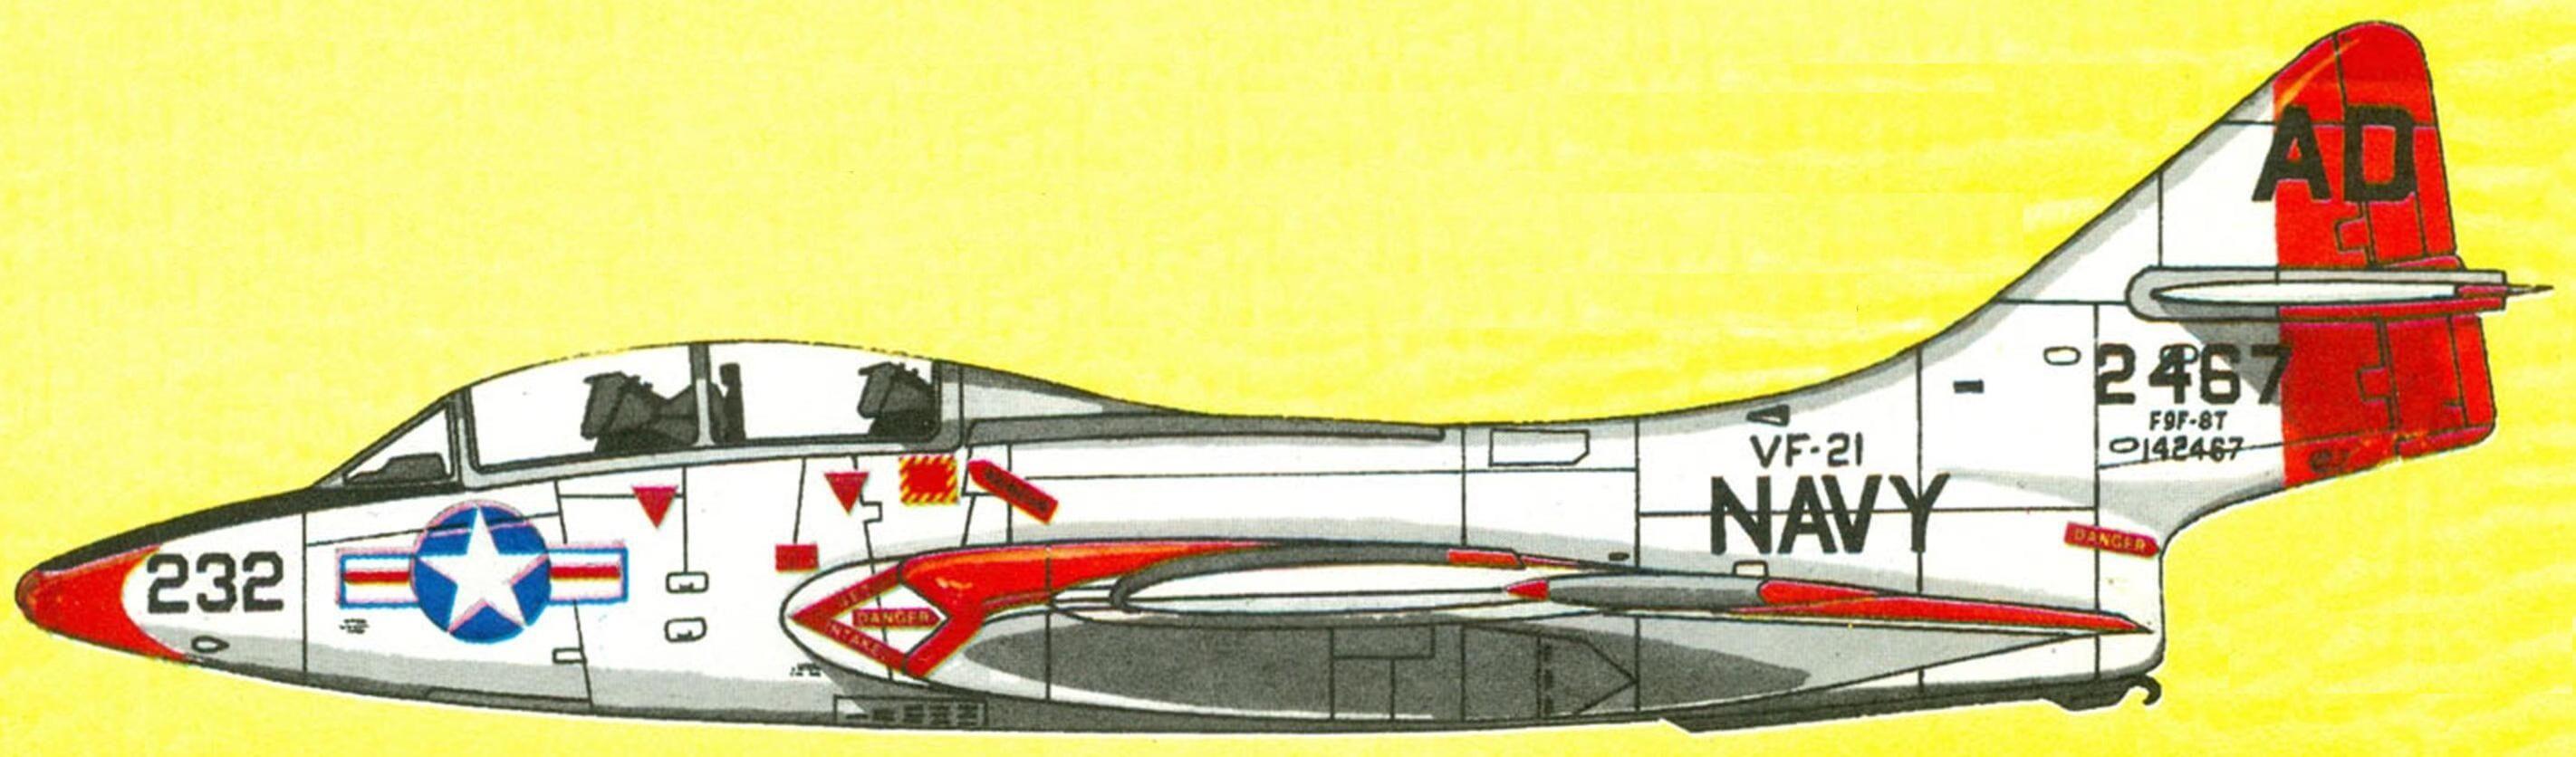 "Спарка TF-9J тренировочной эскадрильи VF-21 ""Freelancers"", база Wilmington, 1958 г."